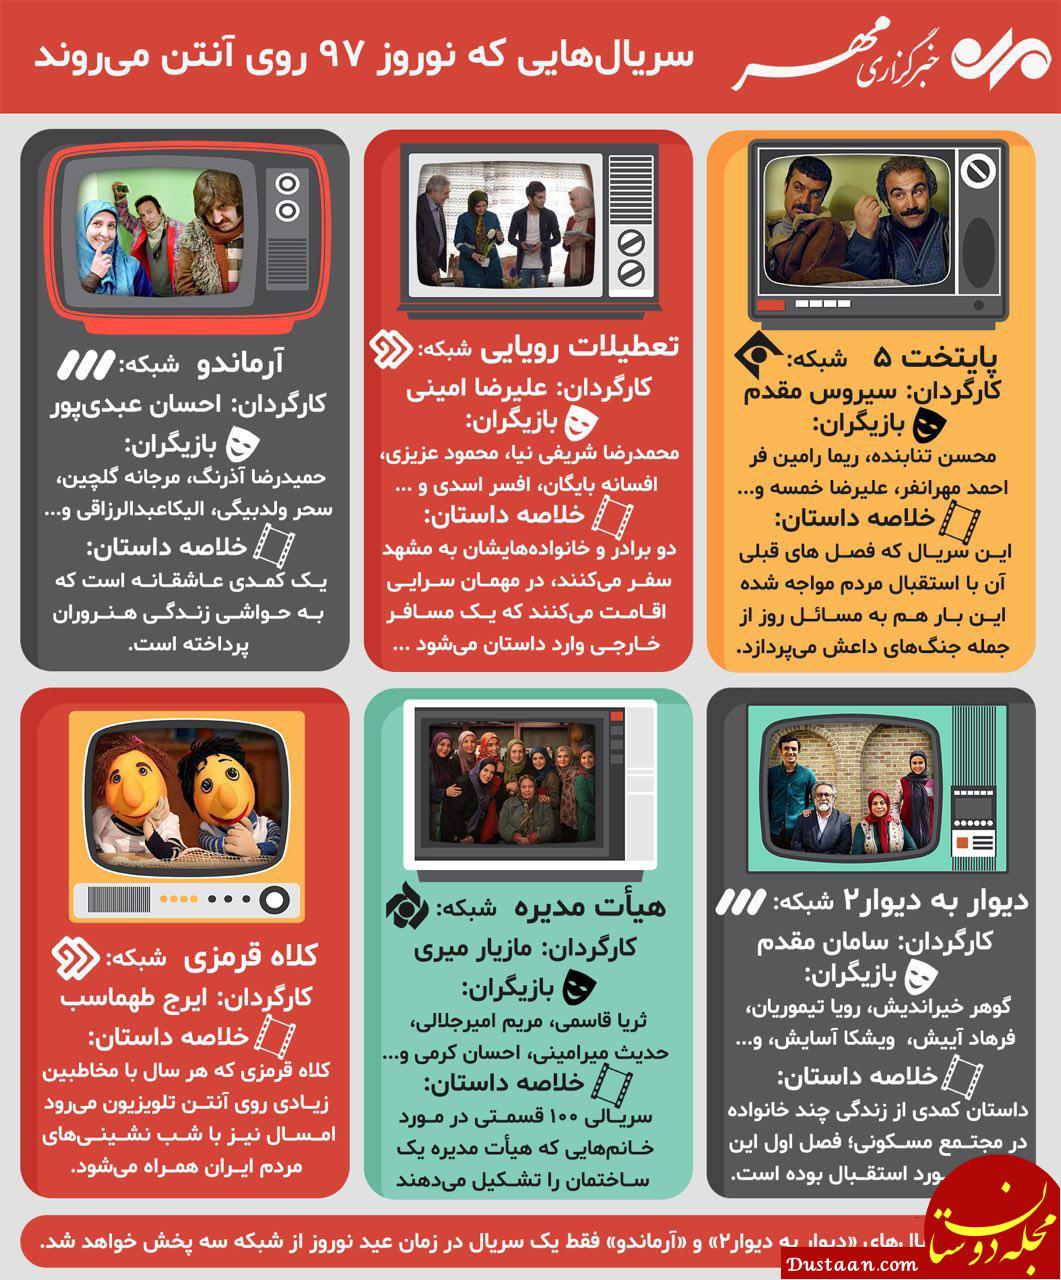 www.dustaan.com سریال های نوروزی تلویزیون در یک نگاه +عکس